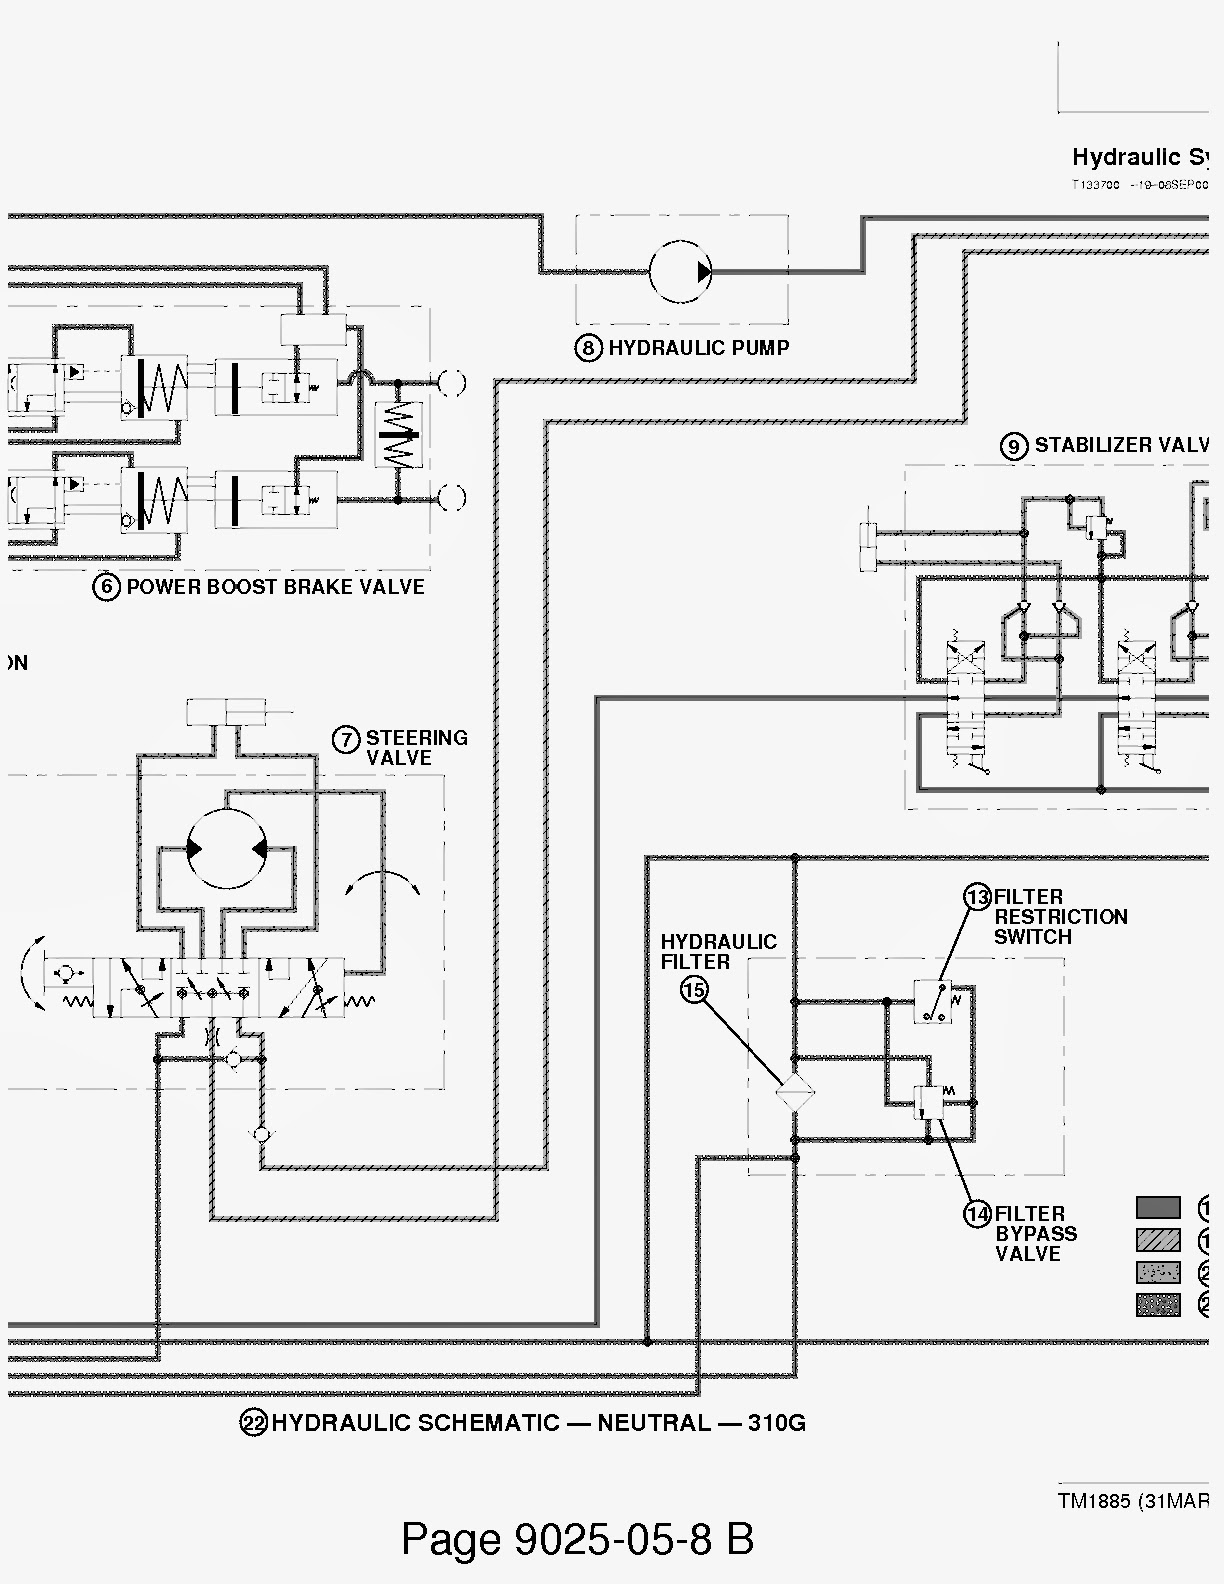 hight resolution of wrg 9829 310g john deere wiring diagram310g john deere wiring diagram